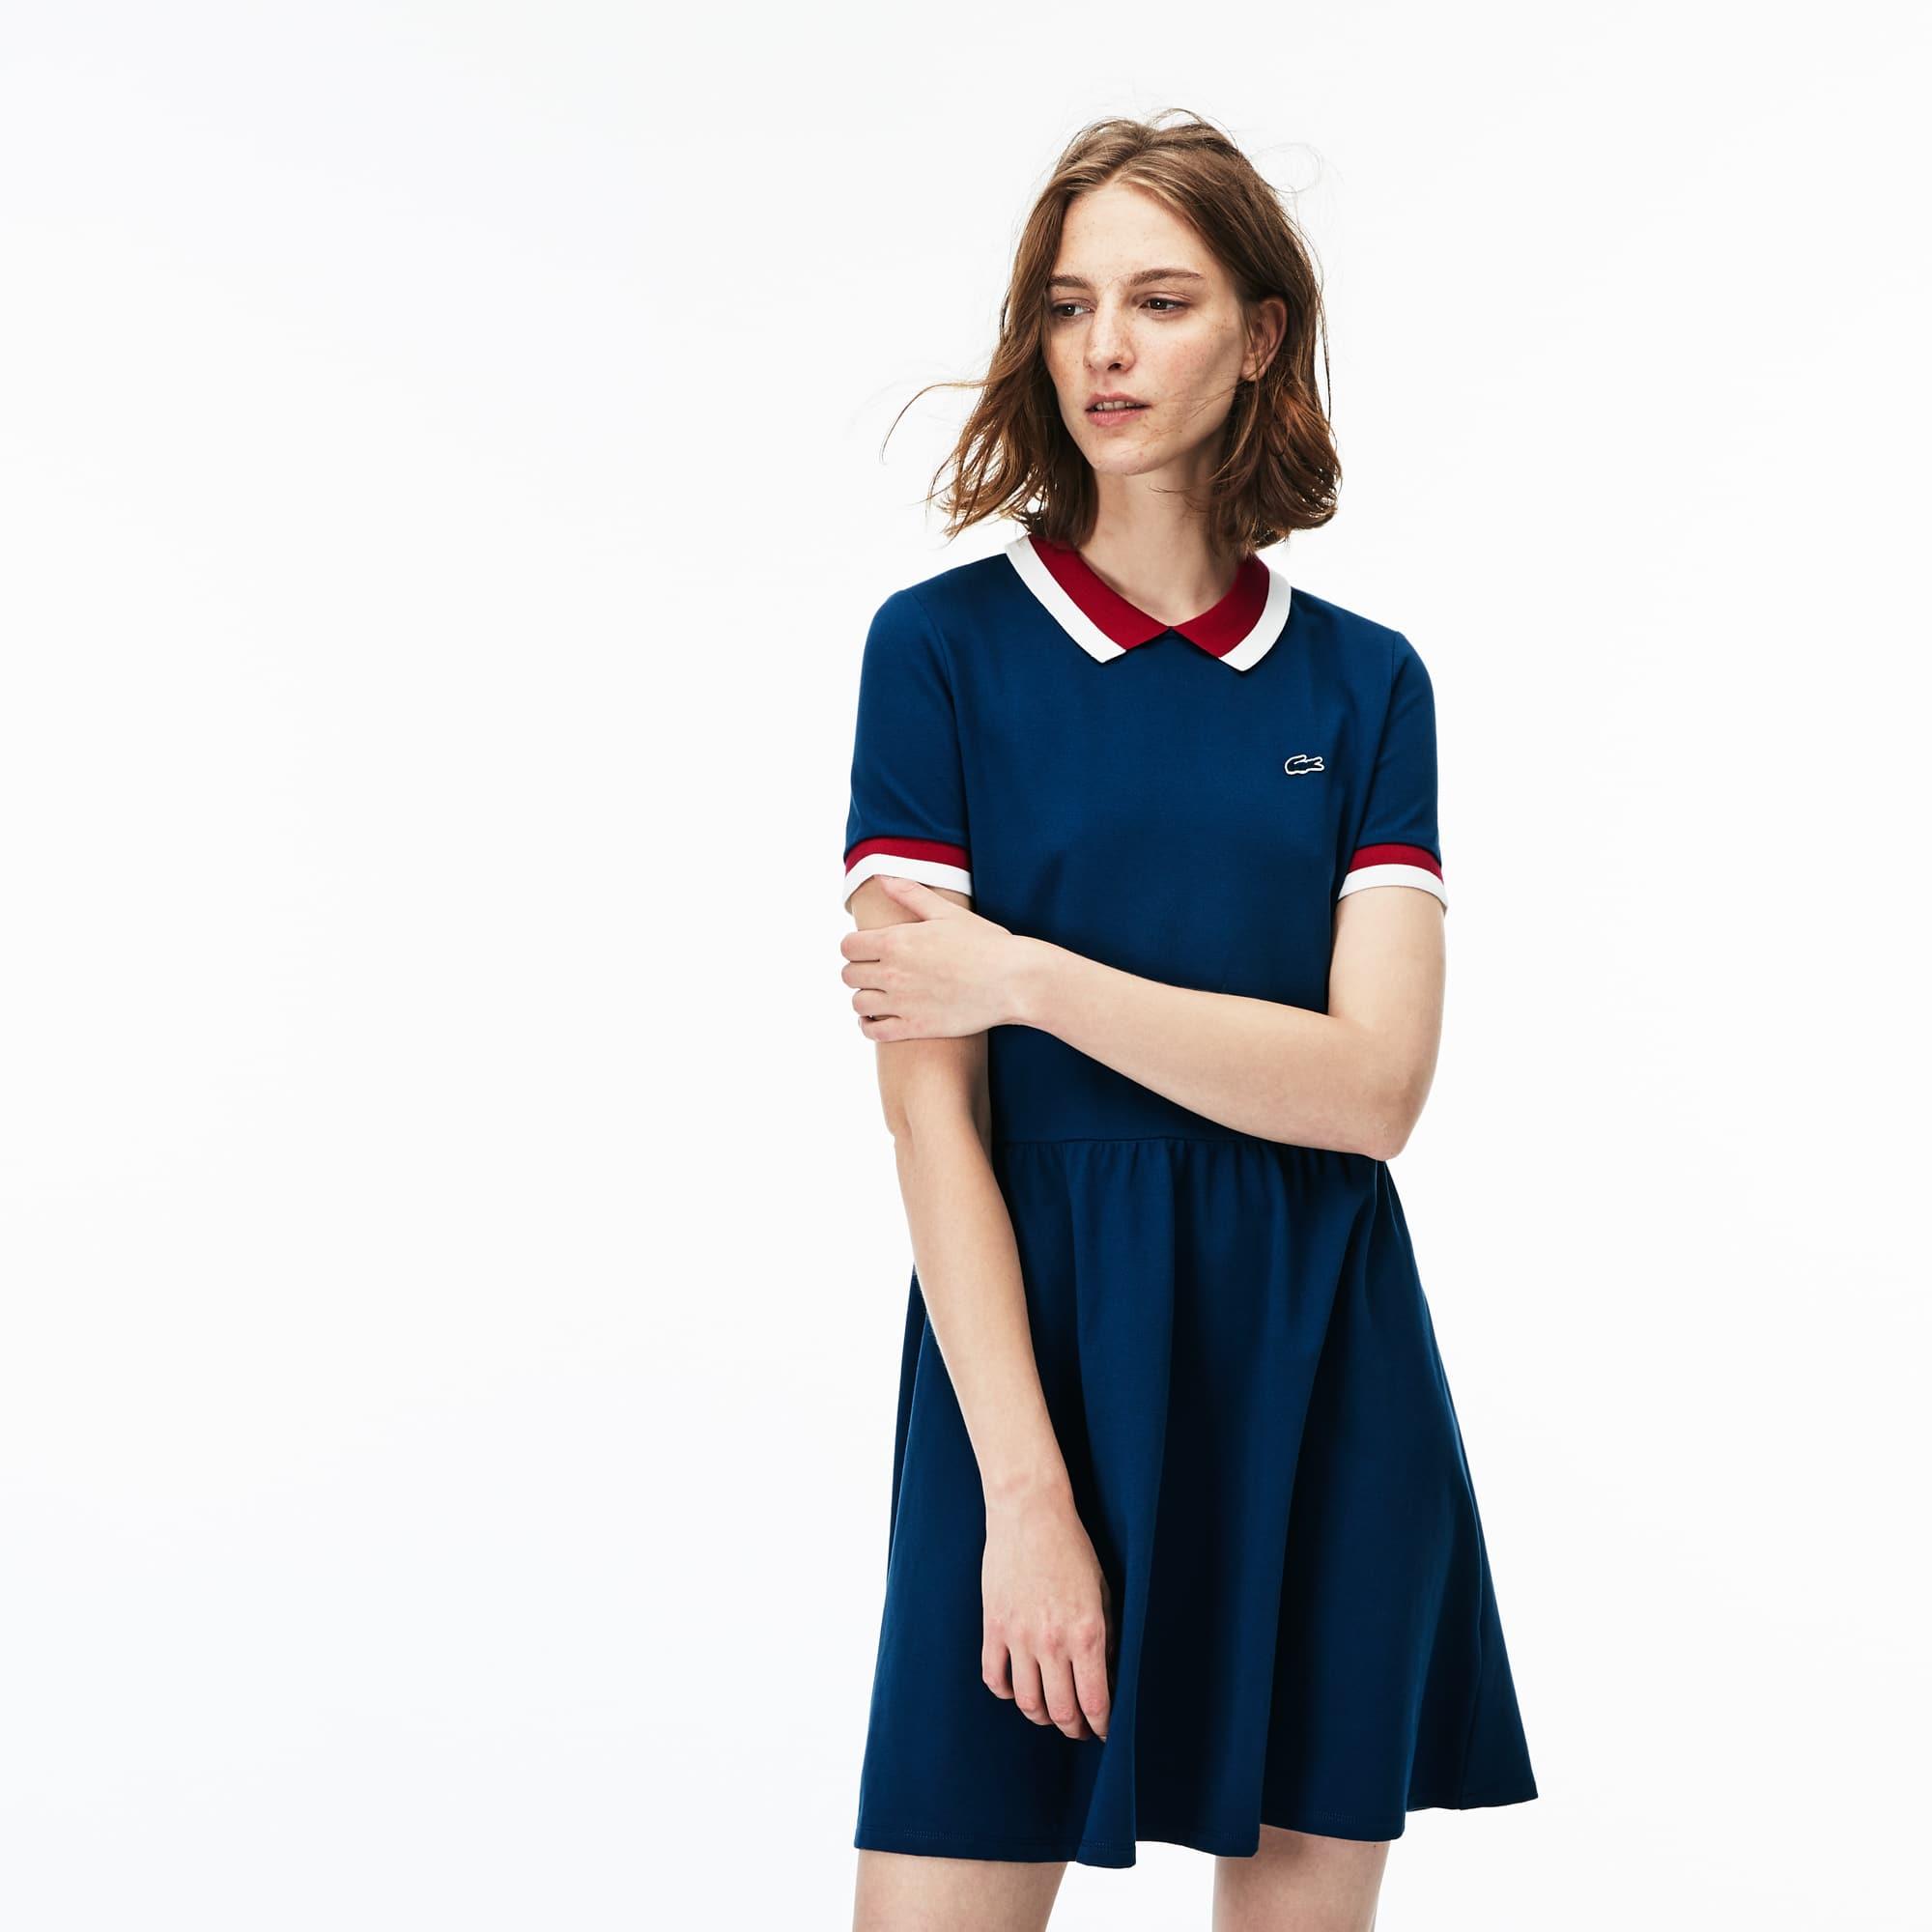 aad044b8d6c1 Women s Clothing on Sale